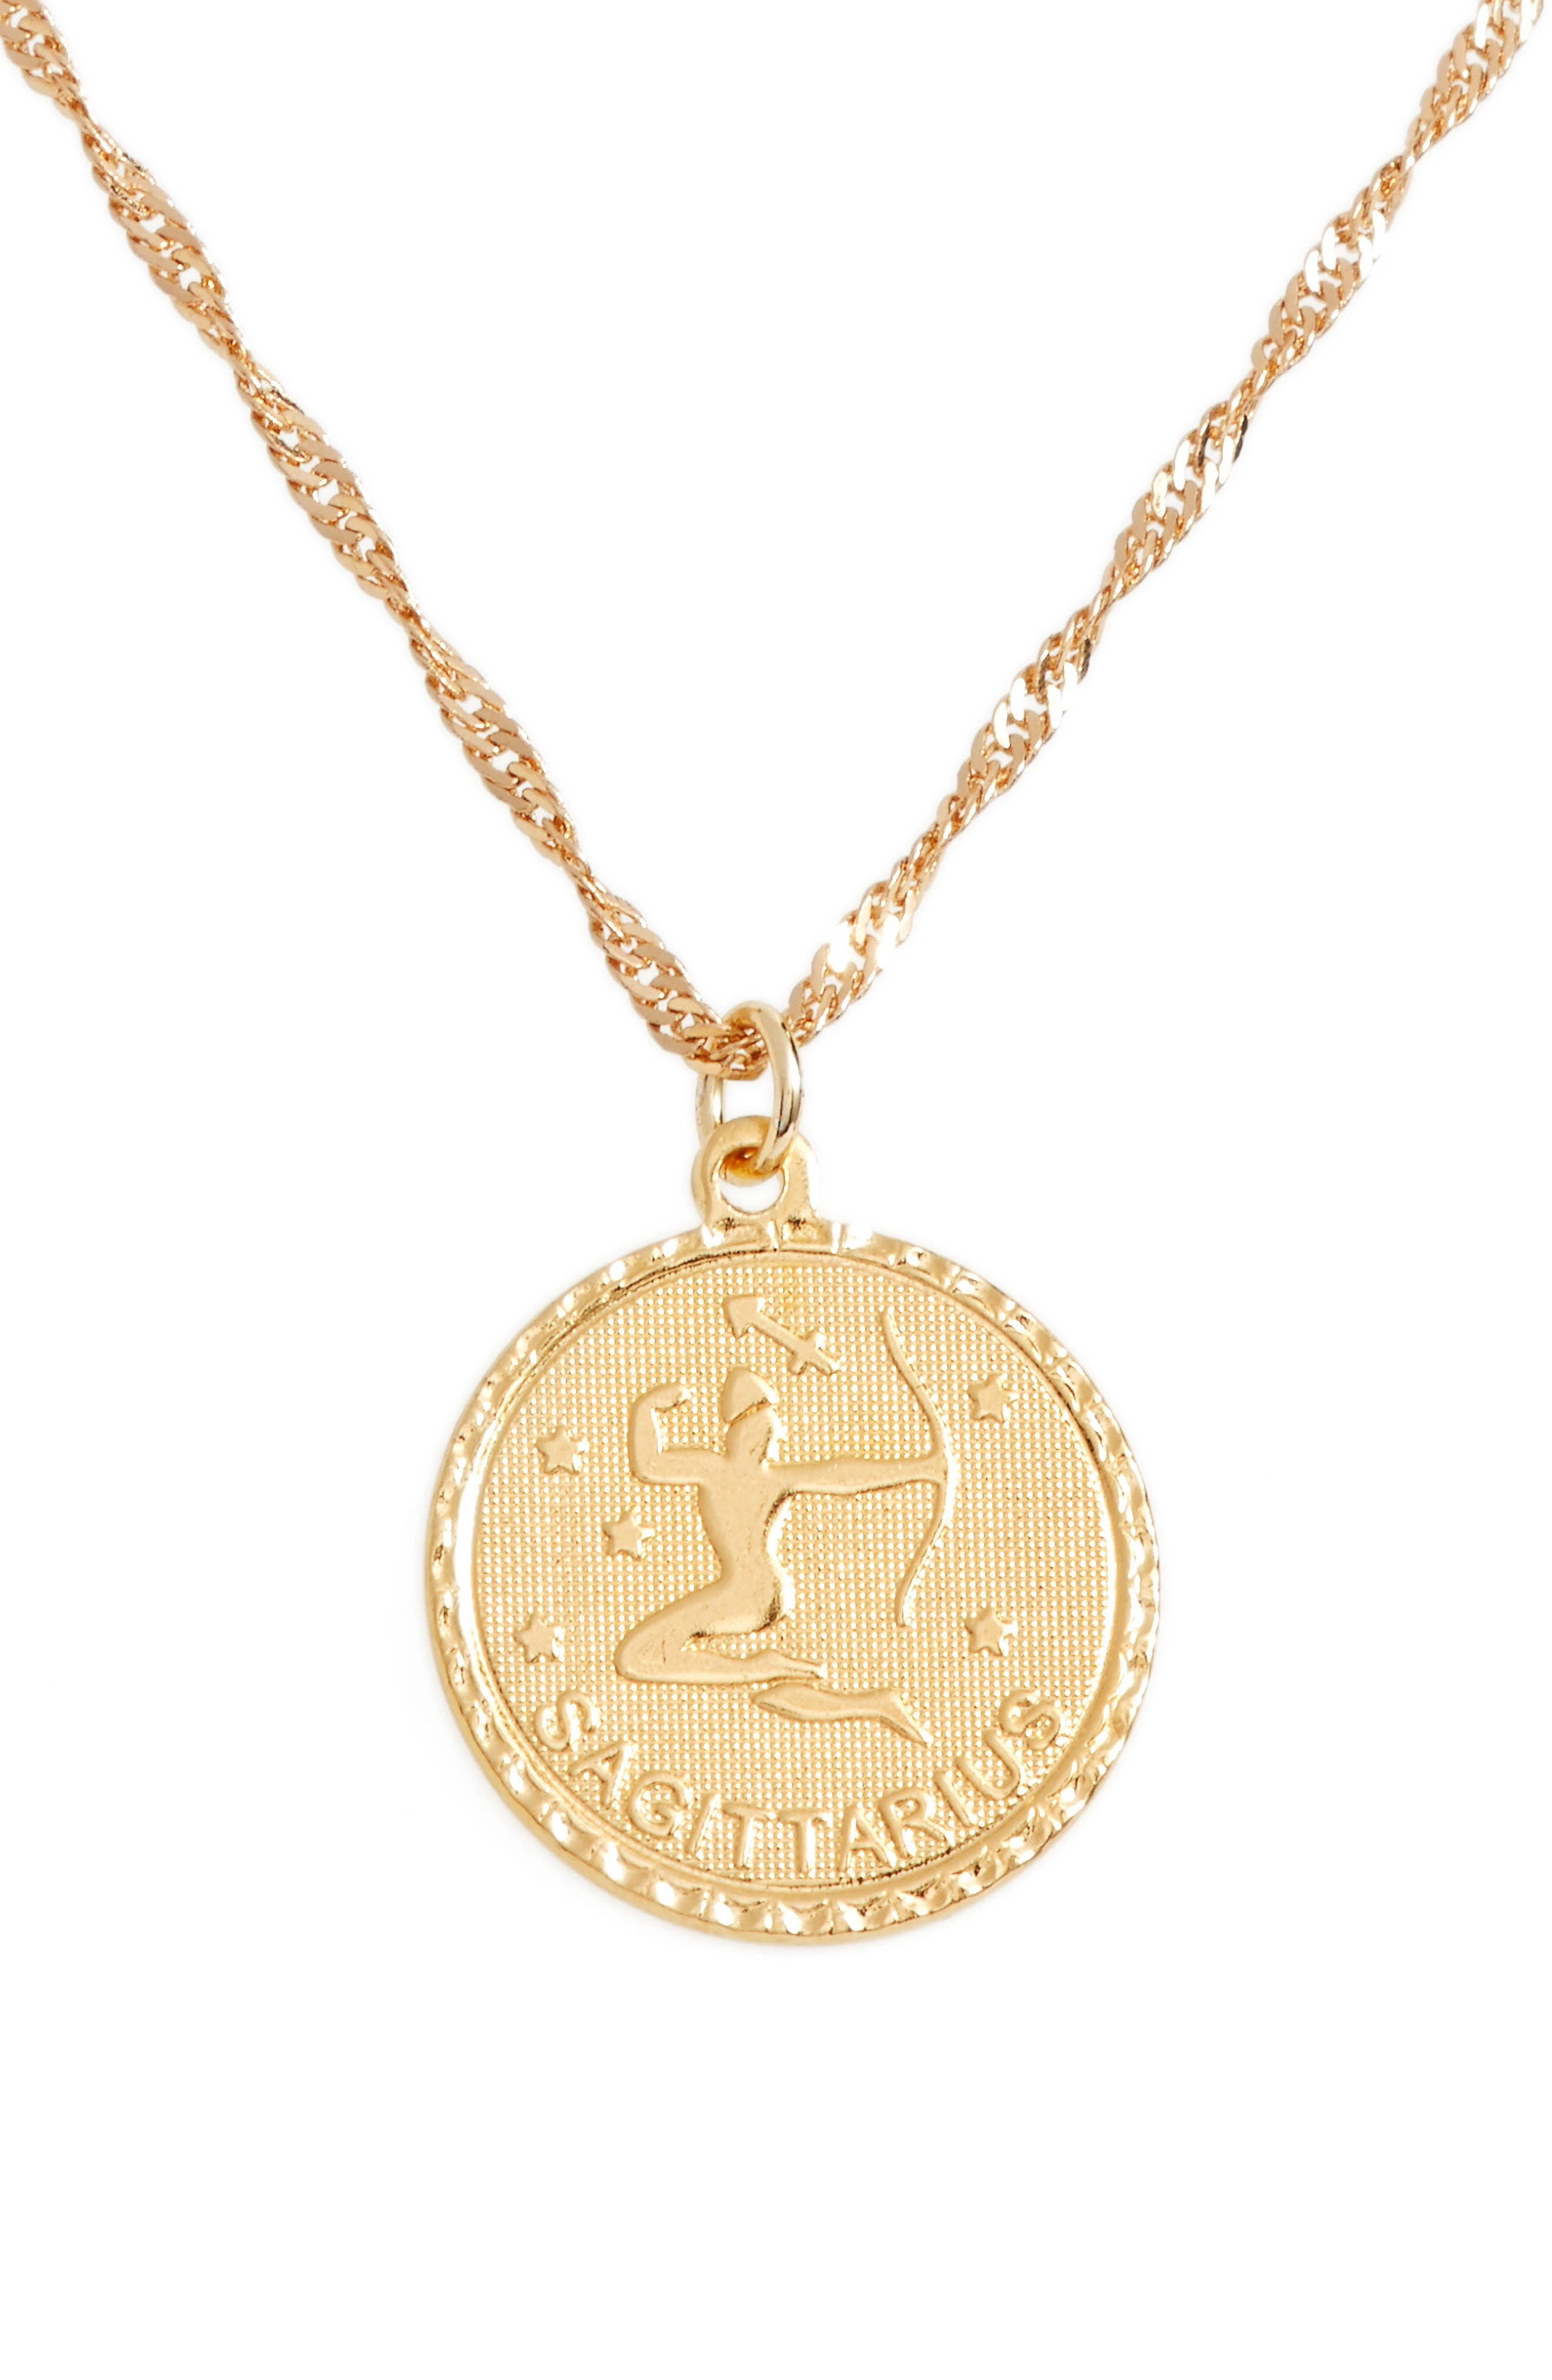 Ascending Sagittarius Pendant Necklace,                         Main,                         color, Yellow Gold